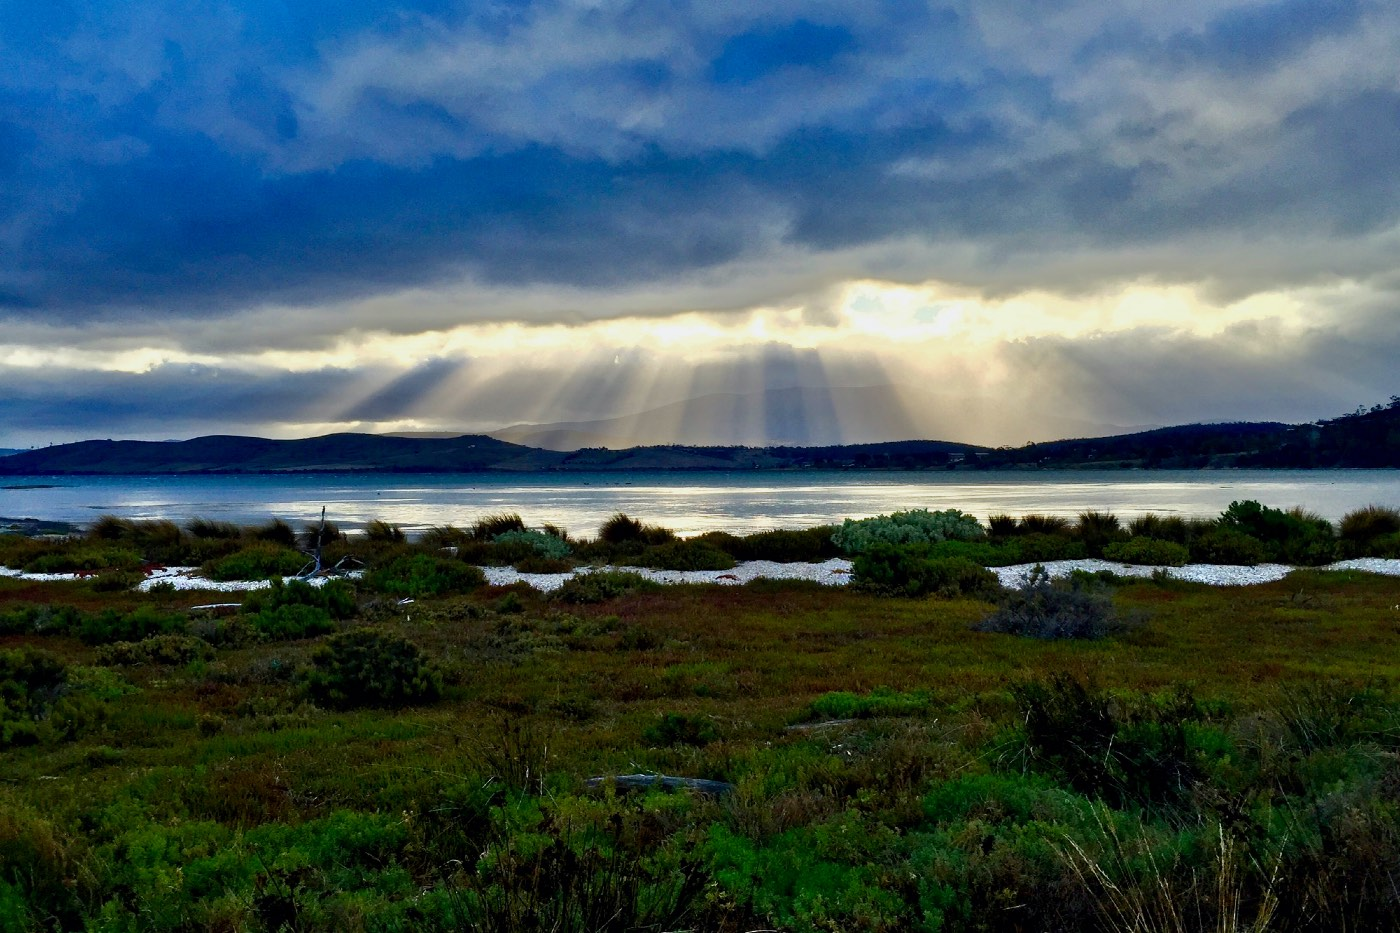 TASMANIA AUSTRALIA ROAD TRIP SCENERY